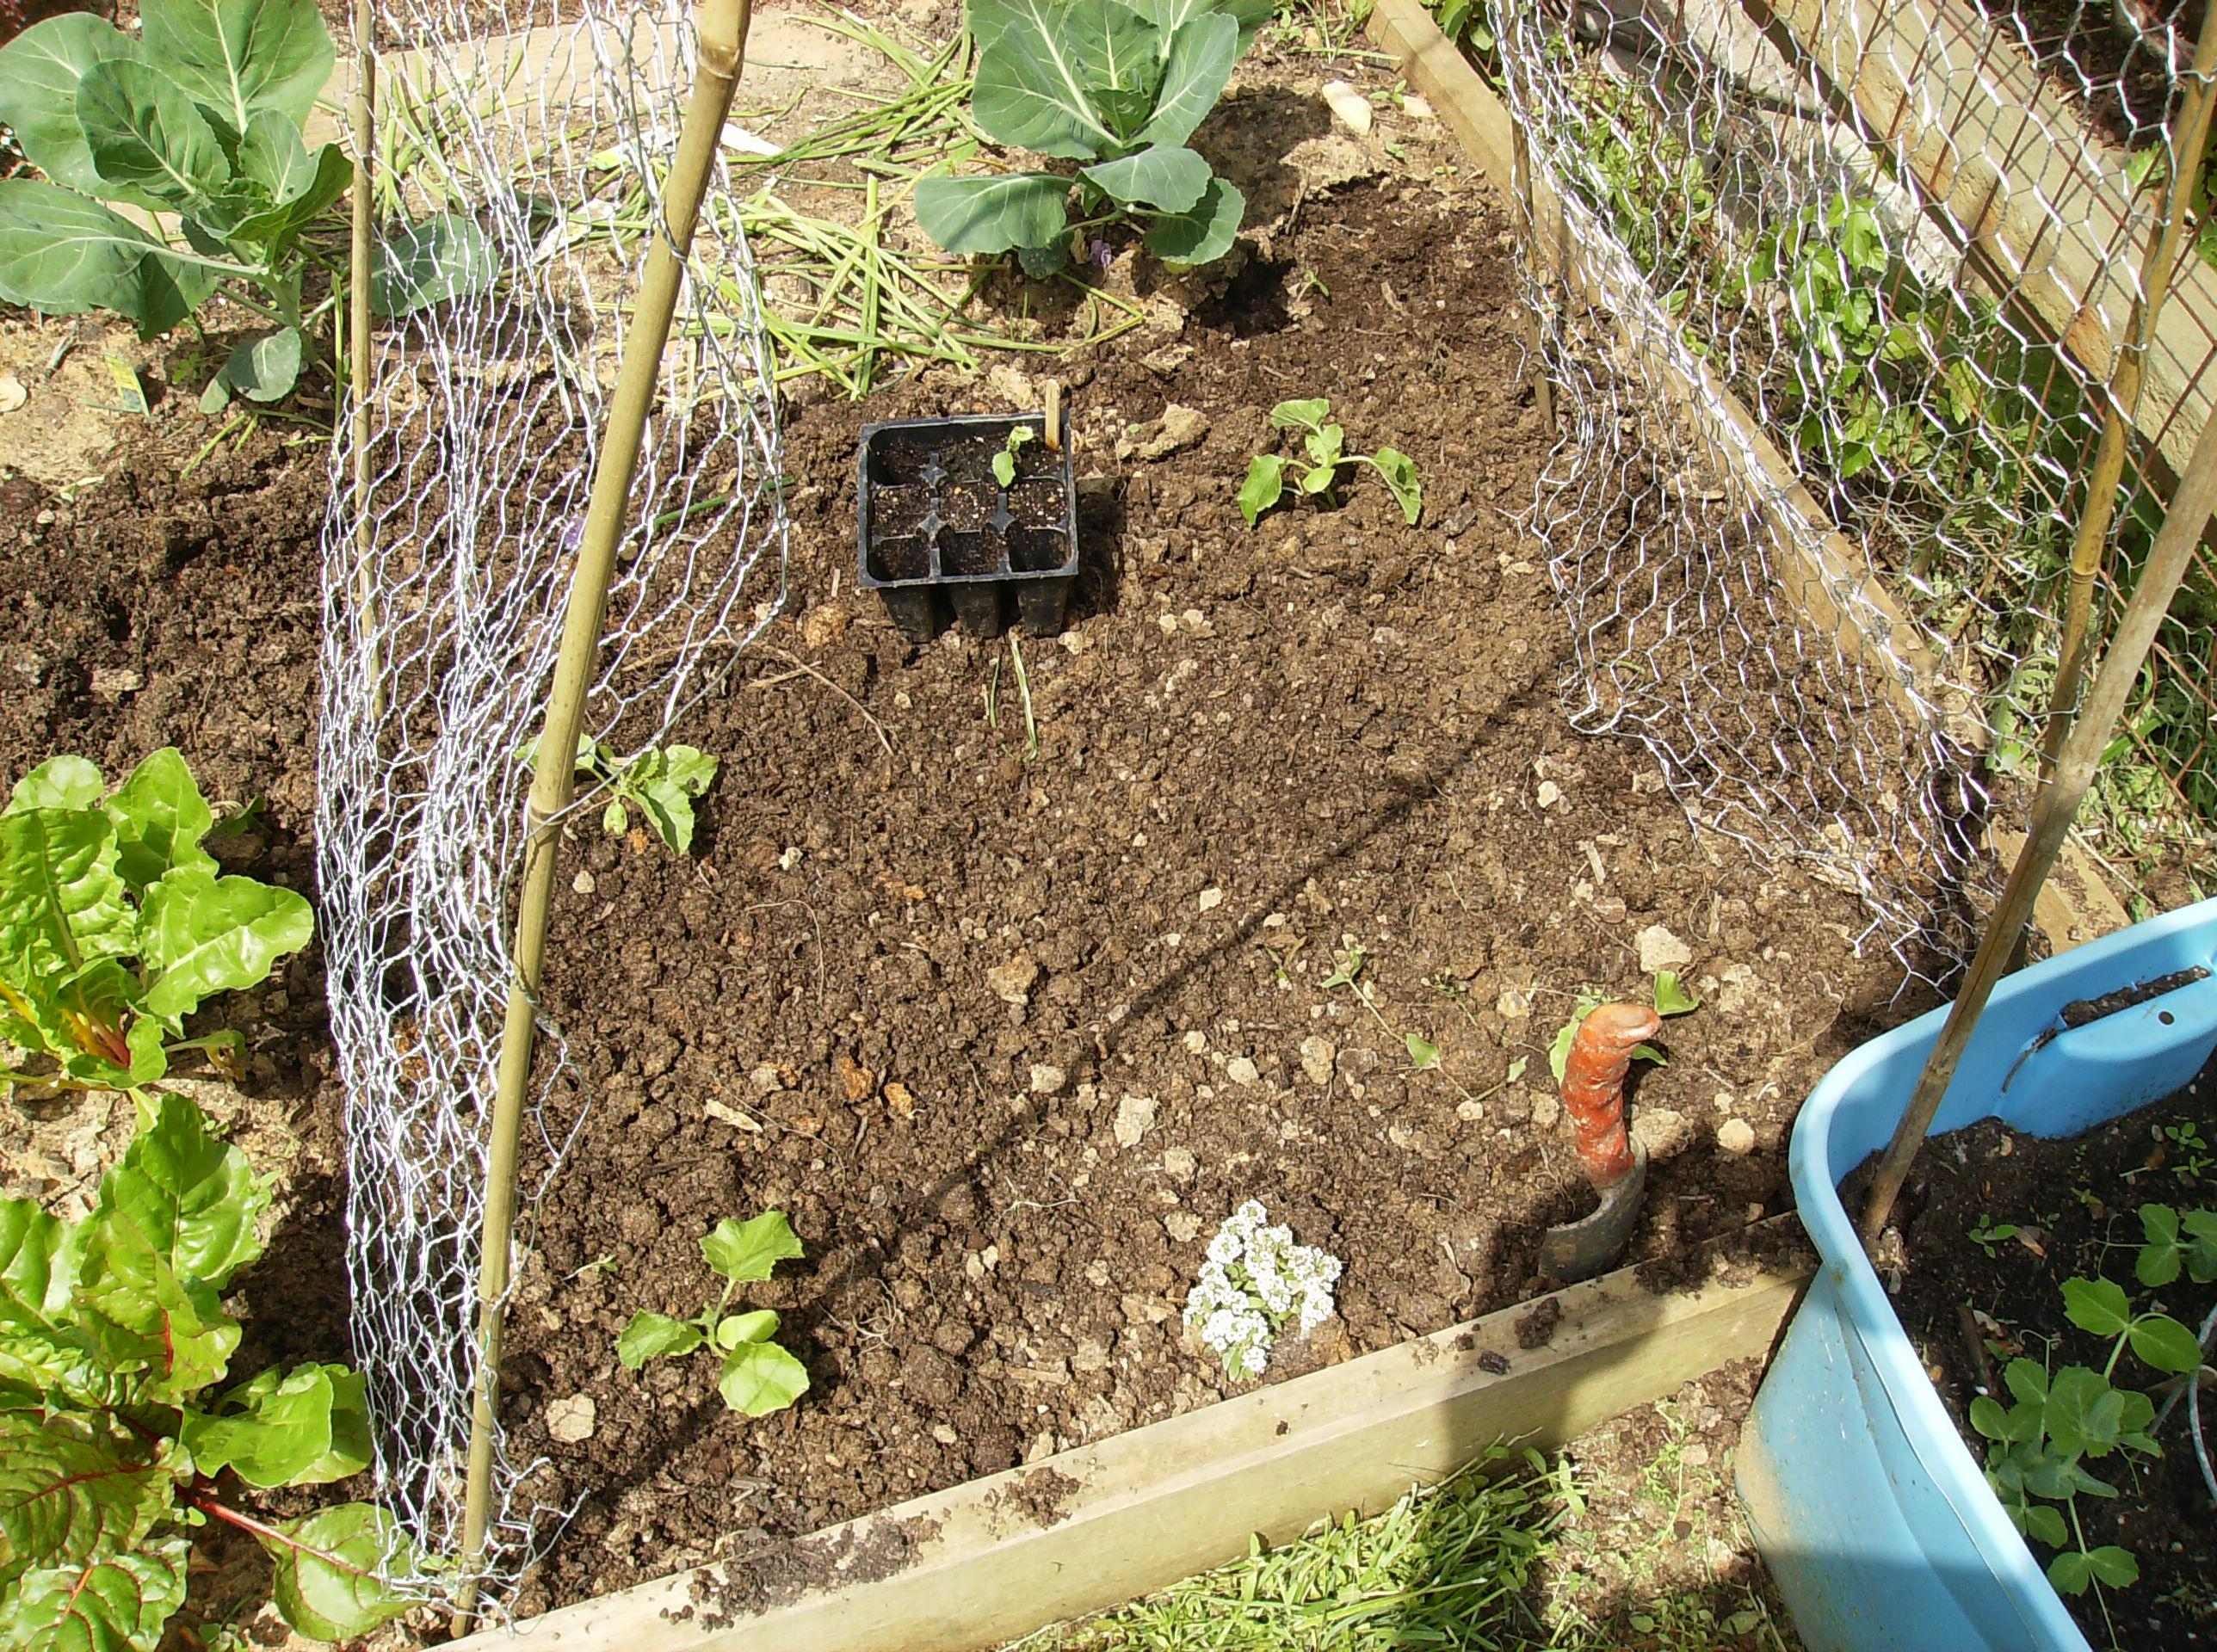 How to Build a Low Cost Vegetable Garden Trellis